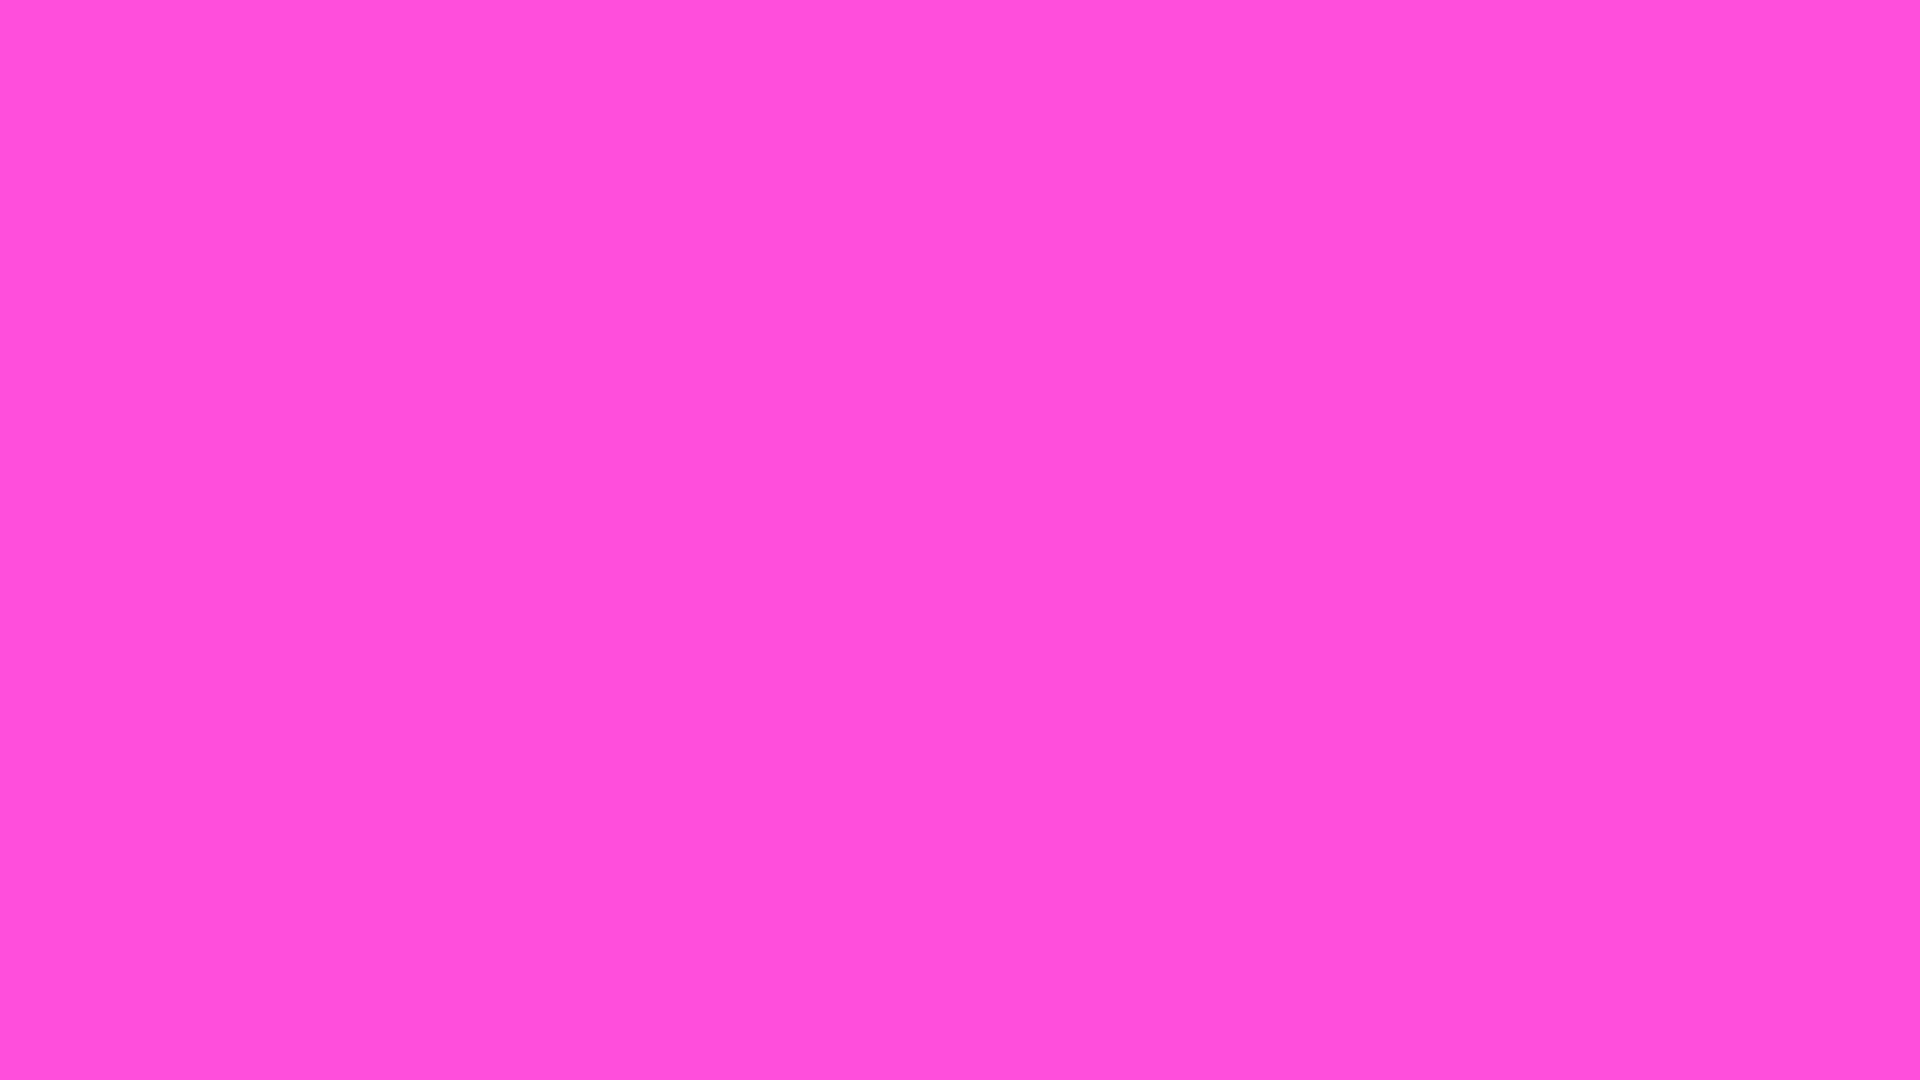 1920x1080 Purple Pizzazz Solid Color Background